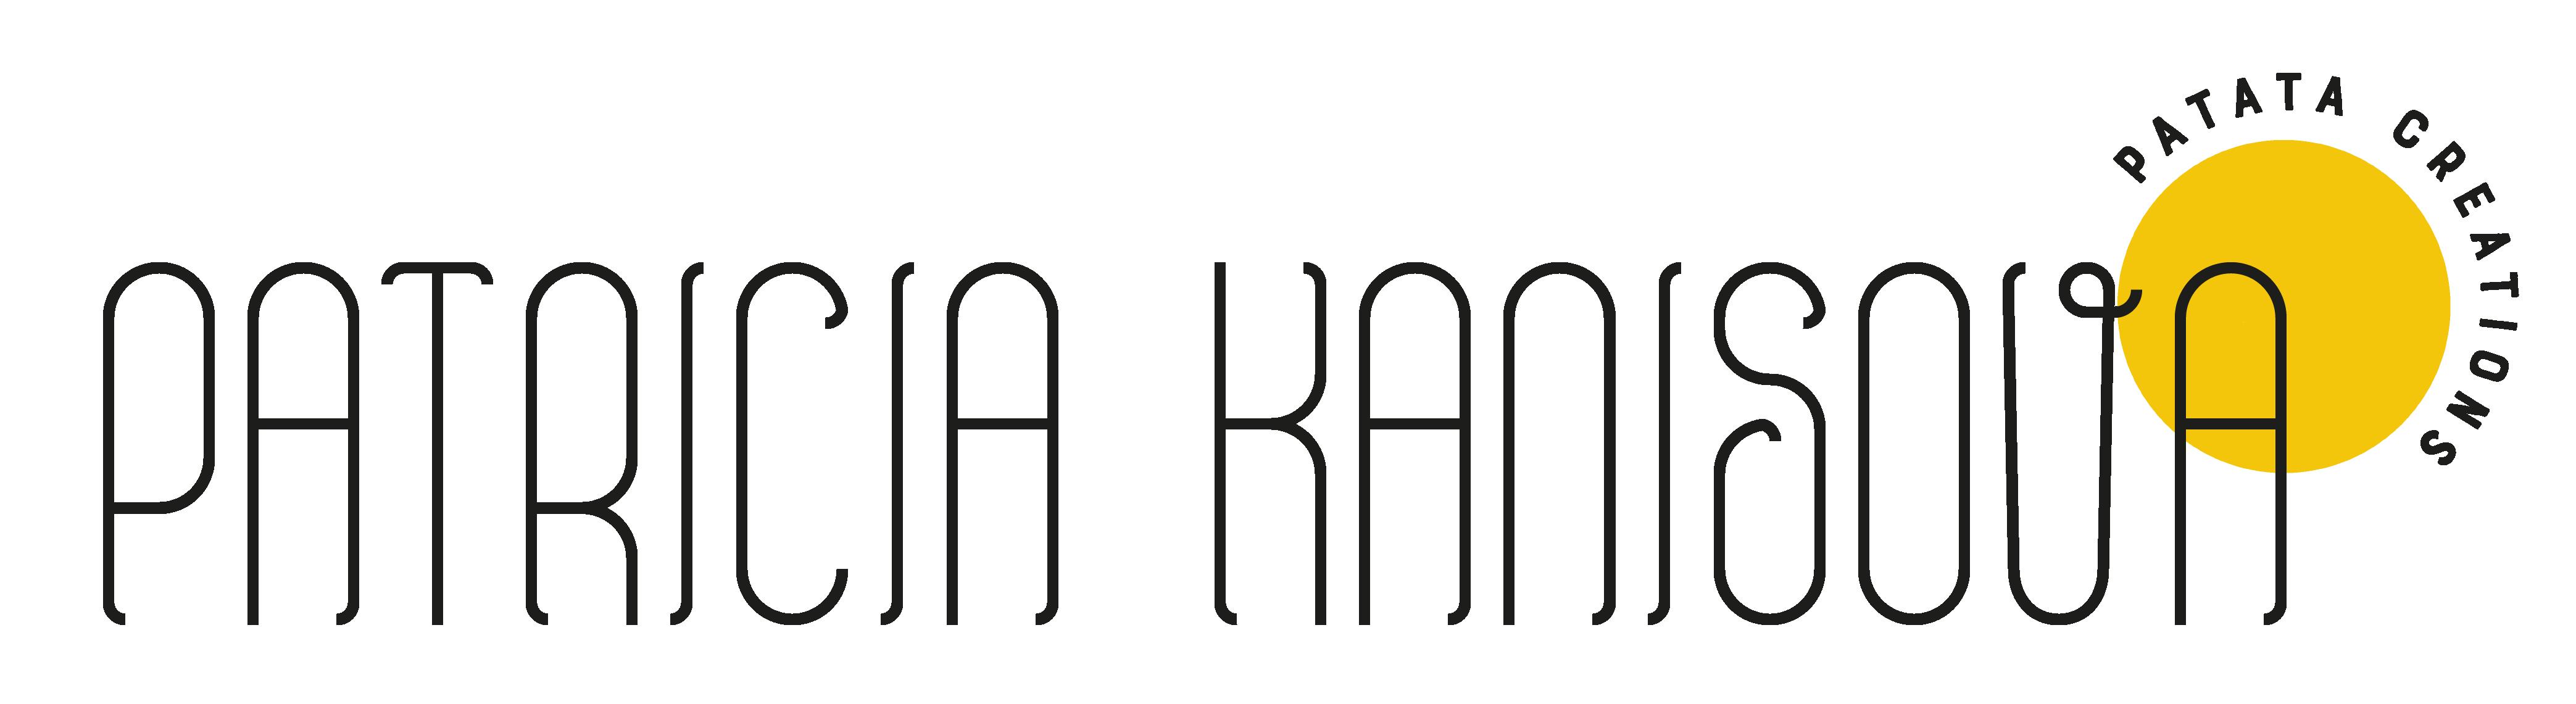 Patricia Kanisova – PATATA Creations